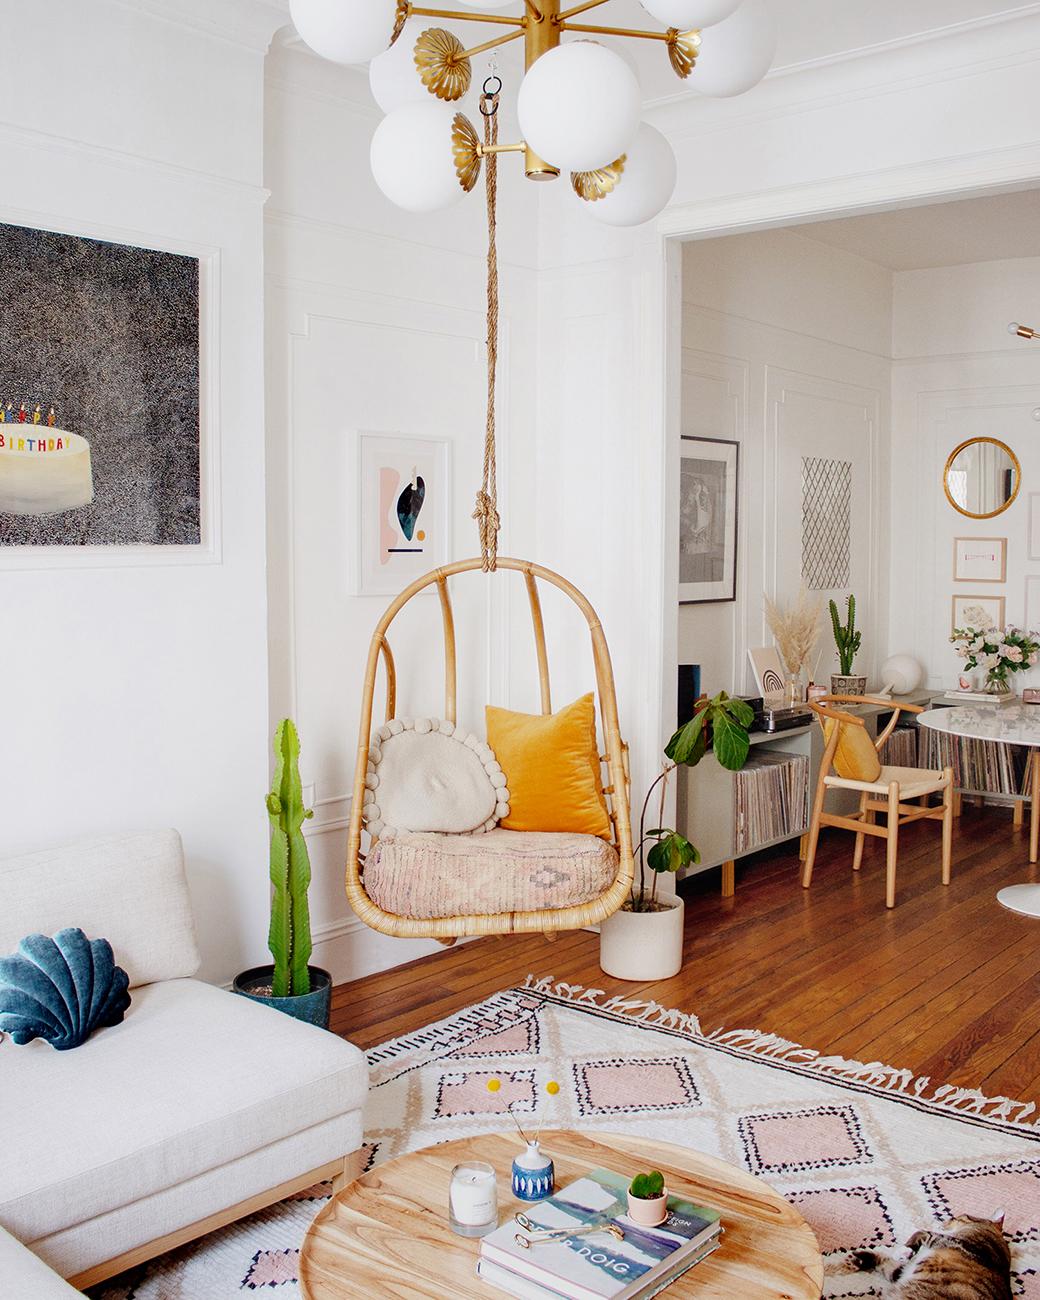 The+Nordroom+-+A+Modern+Bohemian+Apartment+in+Brooklyn.jpg